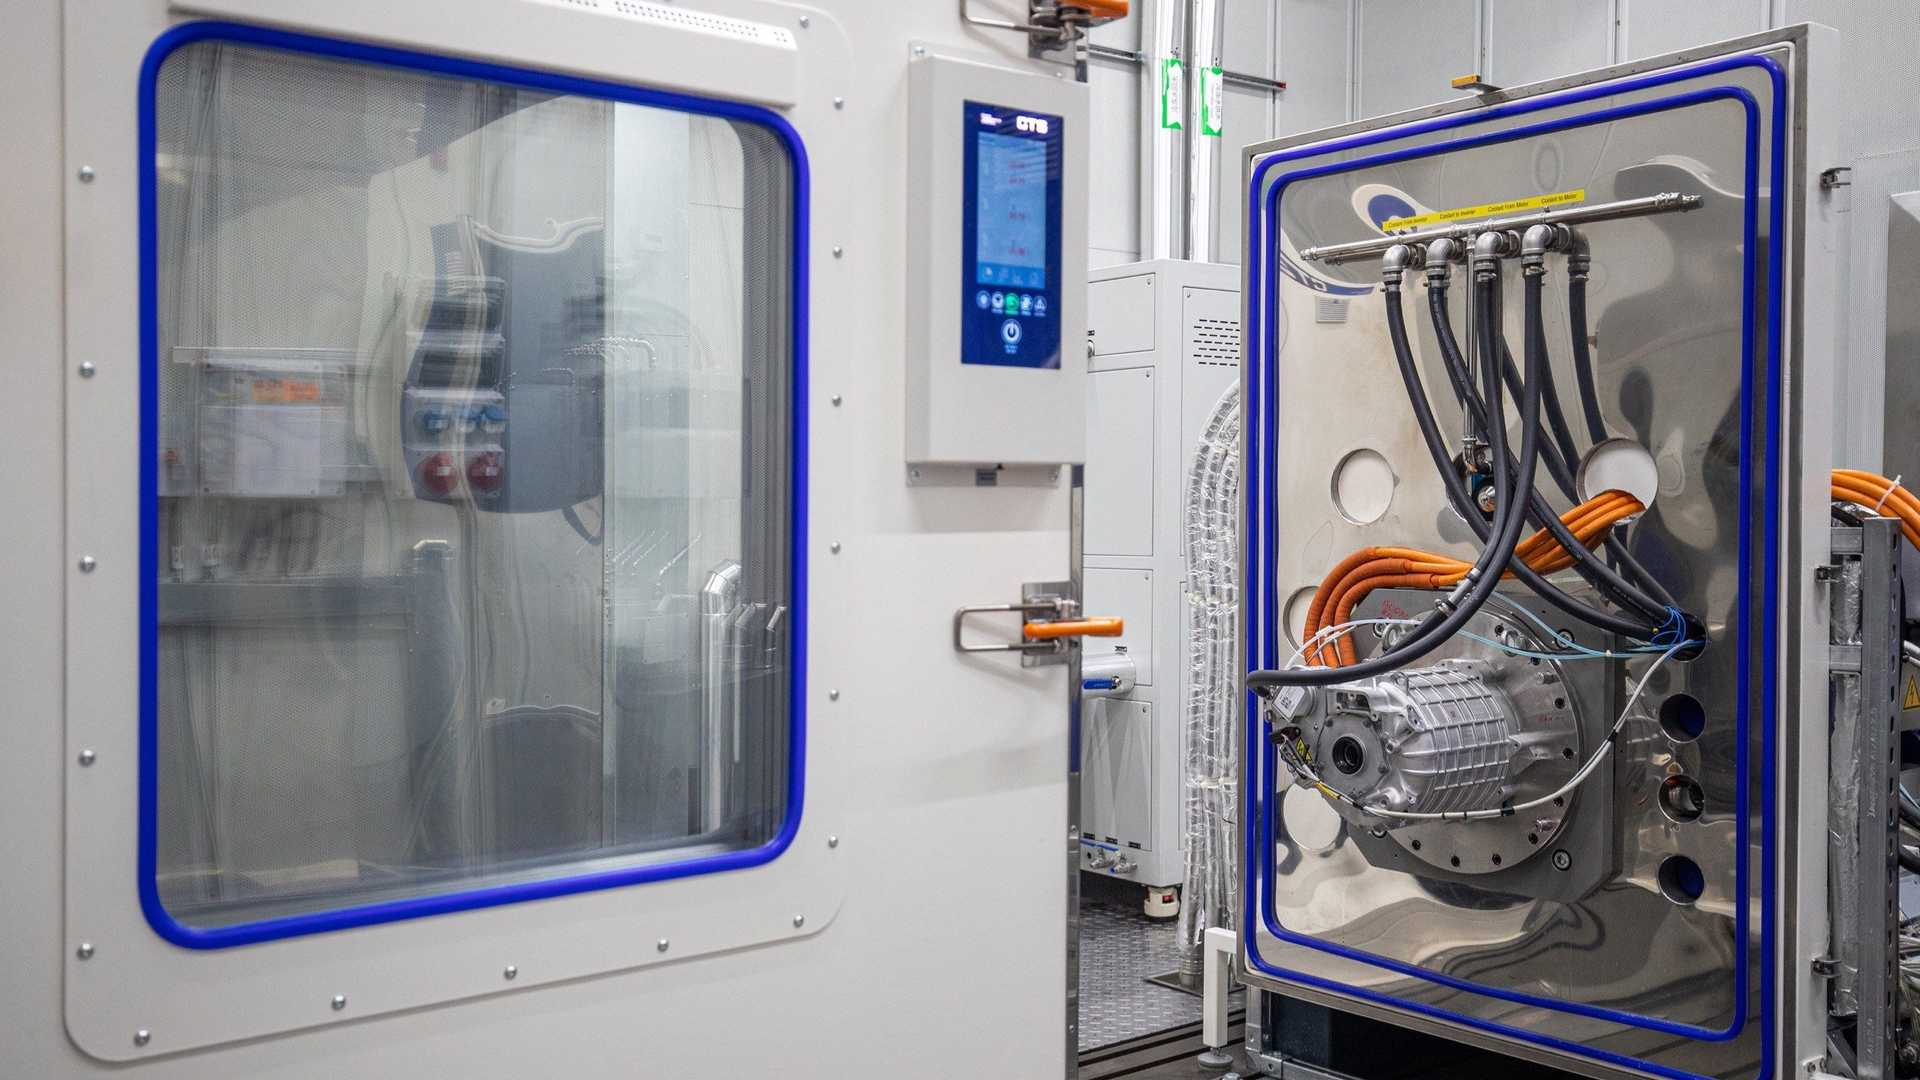 Volvo electric motors - in-house developments